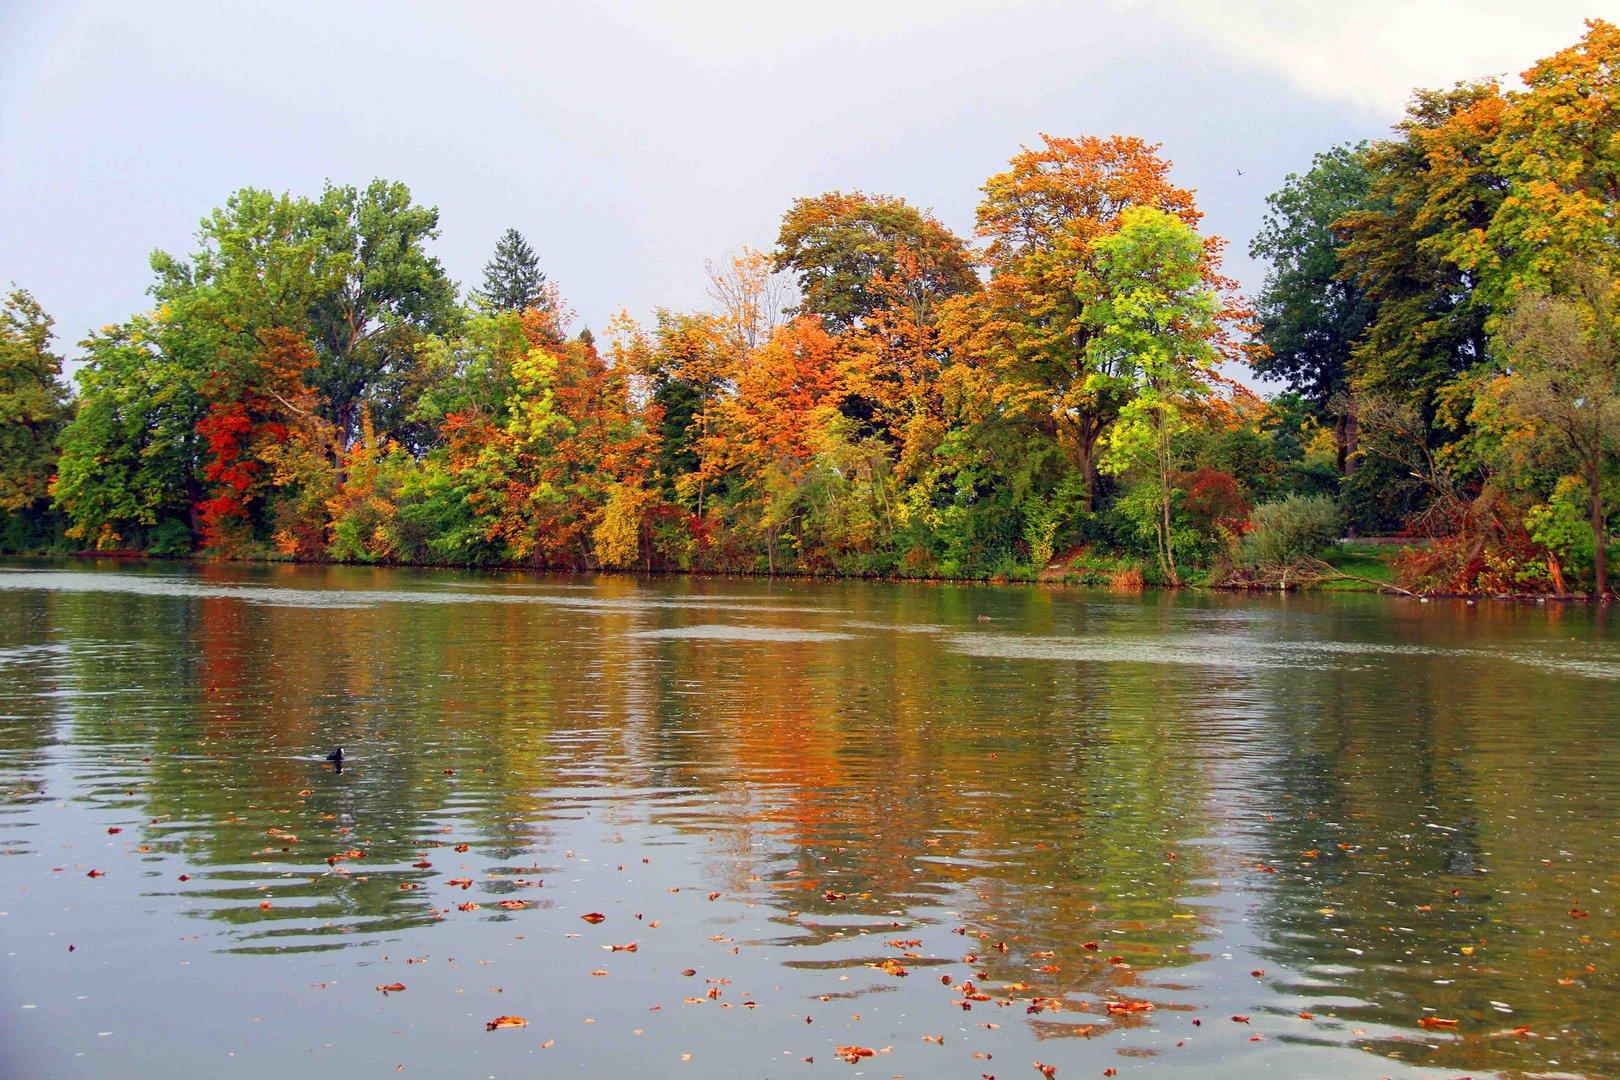 Idylische Herbstimmung am Ulmer Donauufer entlang 3